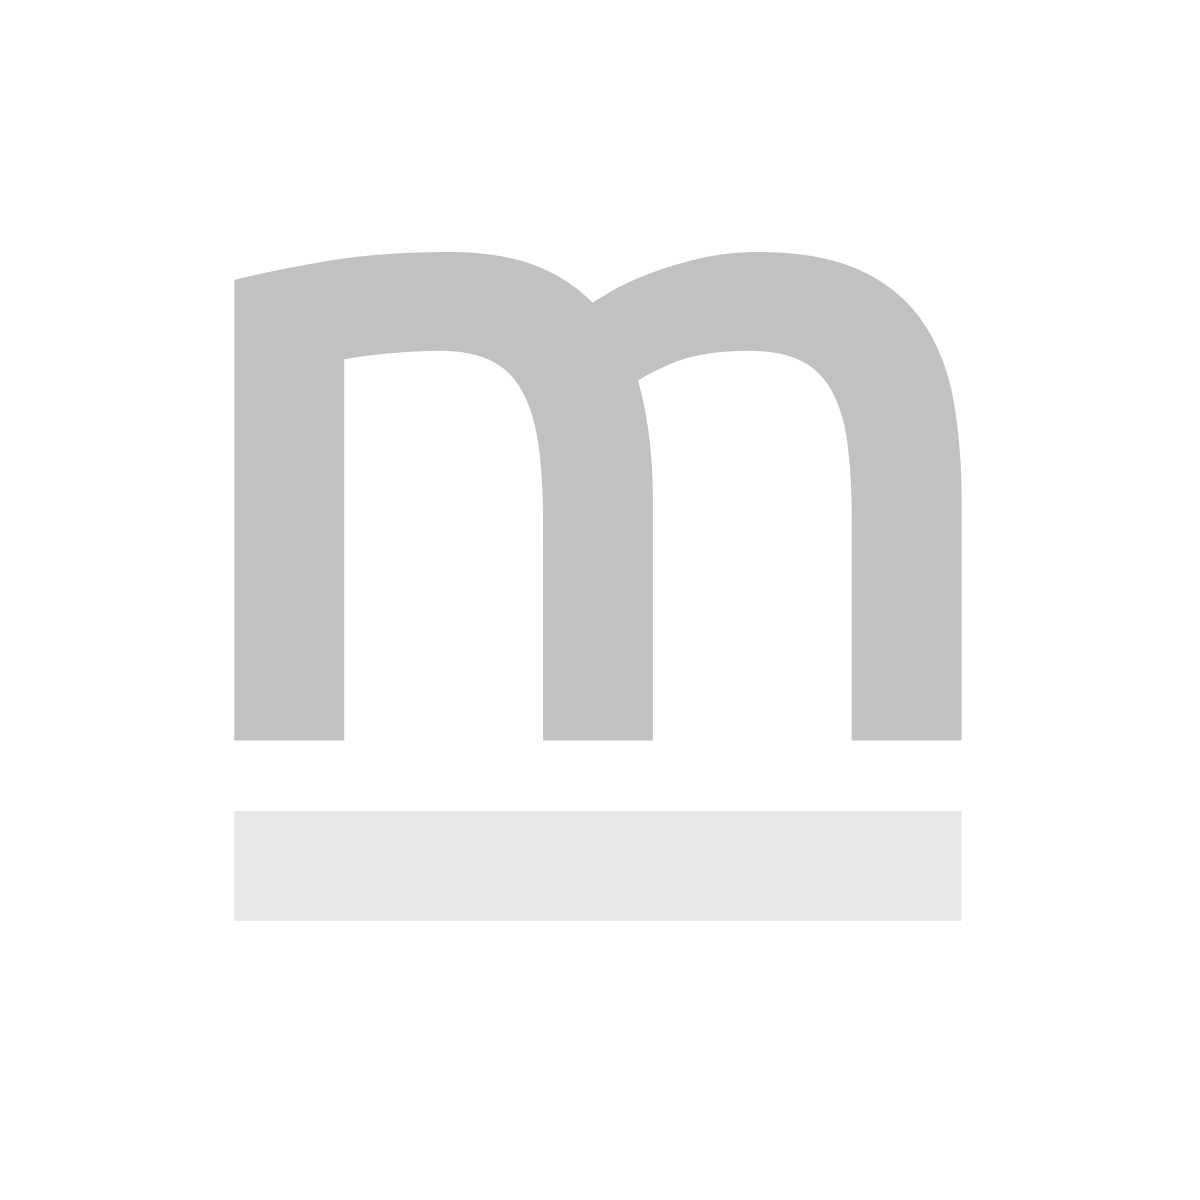 Biokominek Linate biały z certyfikatem TÜV